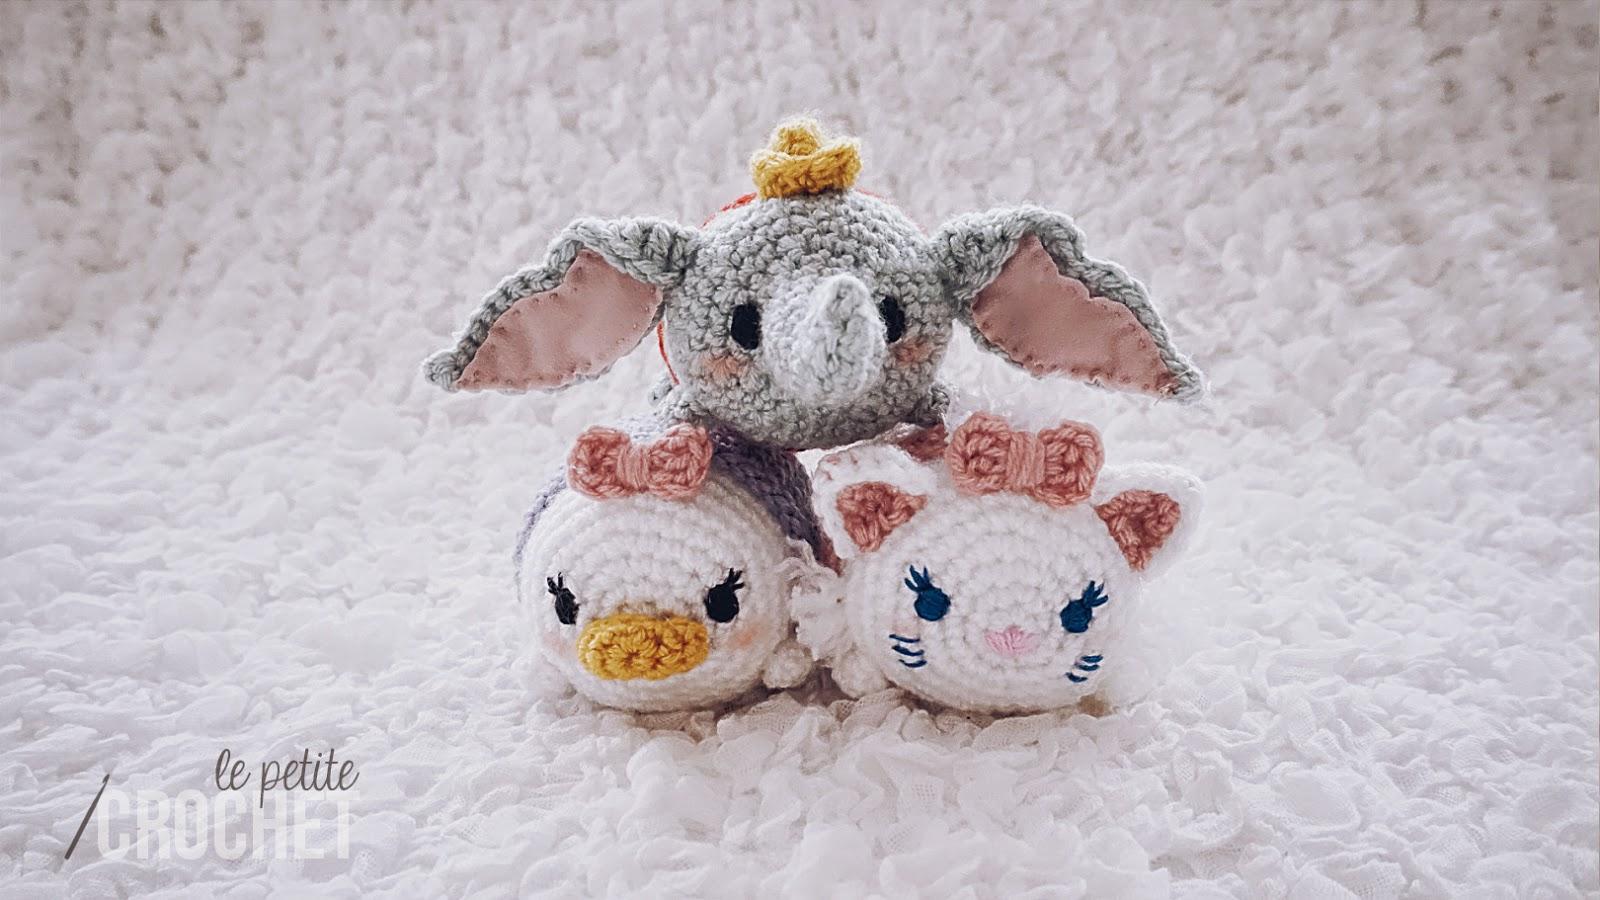 Disney Tsum Tsum Para Colorear Dumbo: Le Petite Crochet: Tsum Tsum